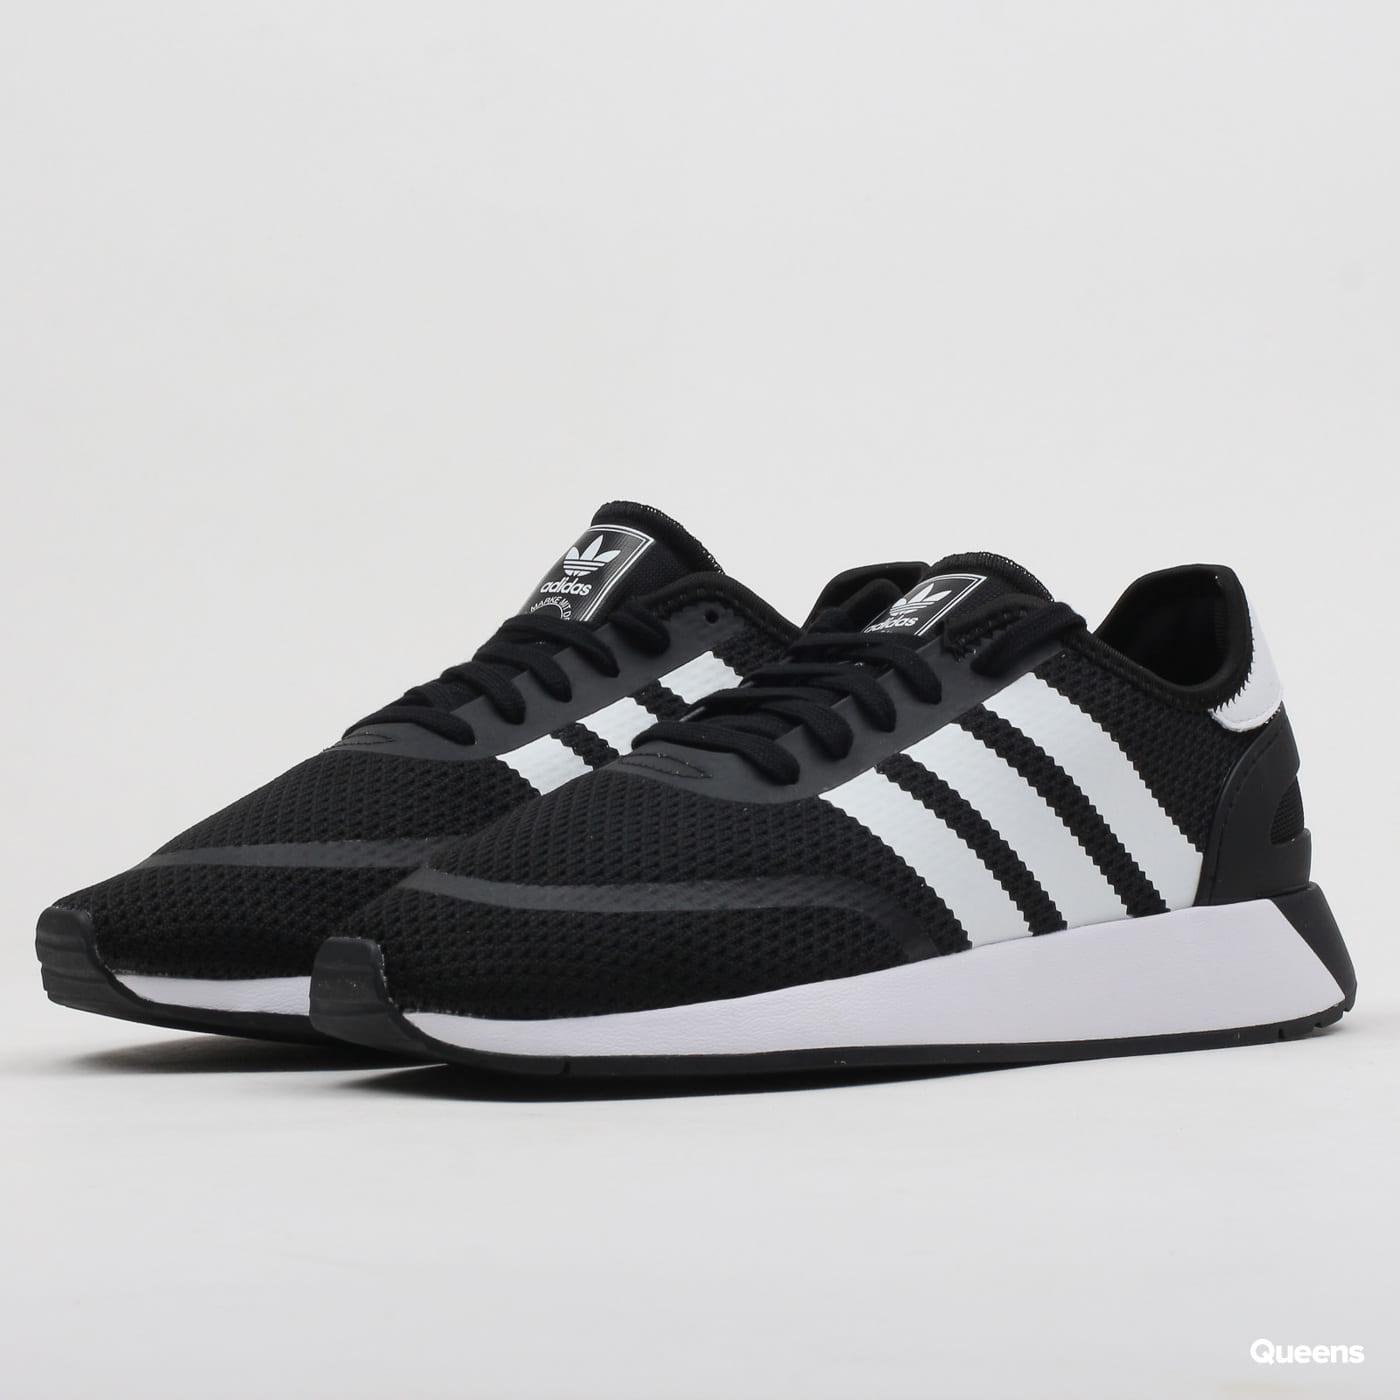 741ca8b71cef Boty adidas Originals N-5923 (B37957) – Queens 💚